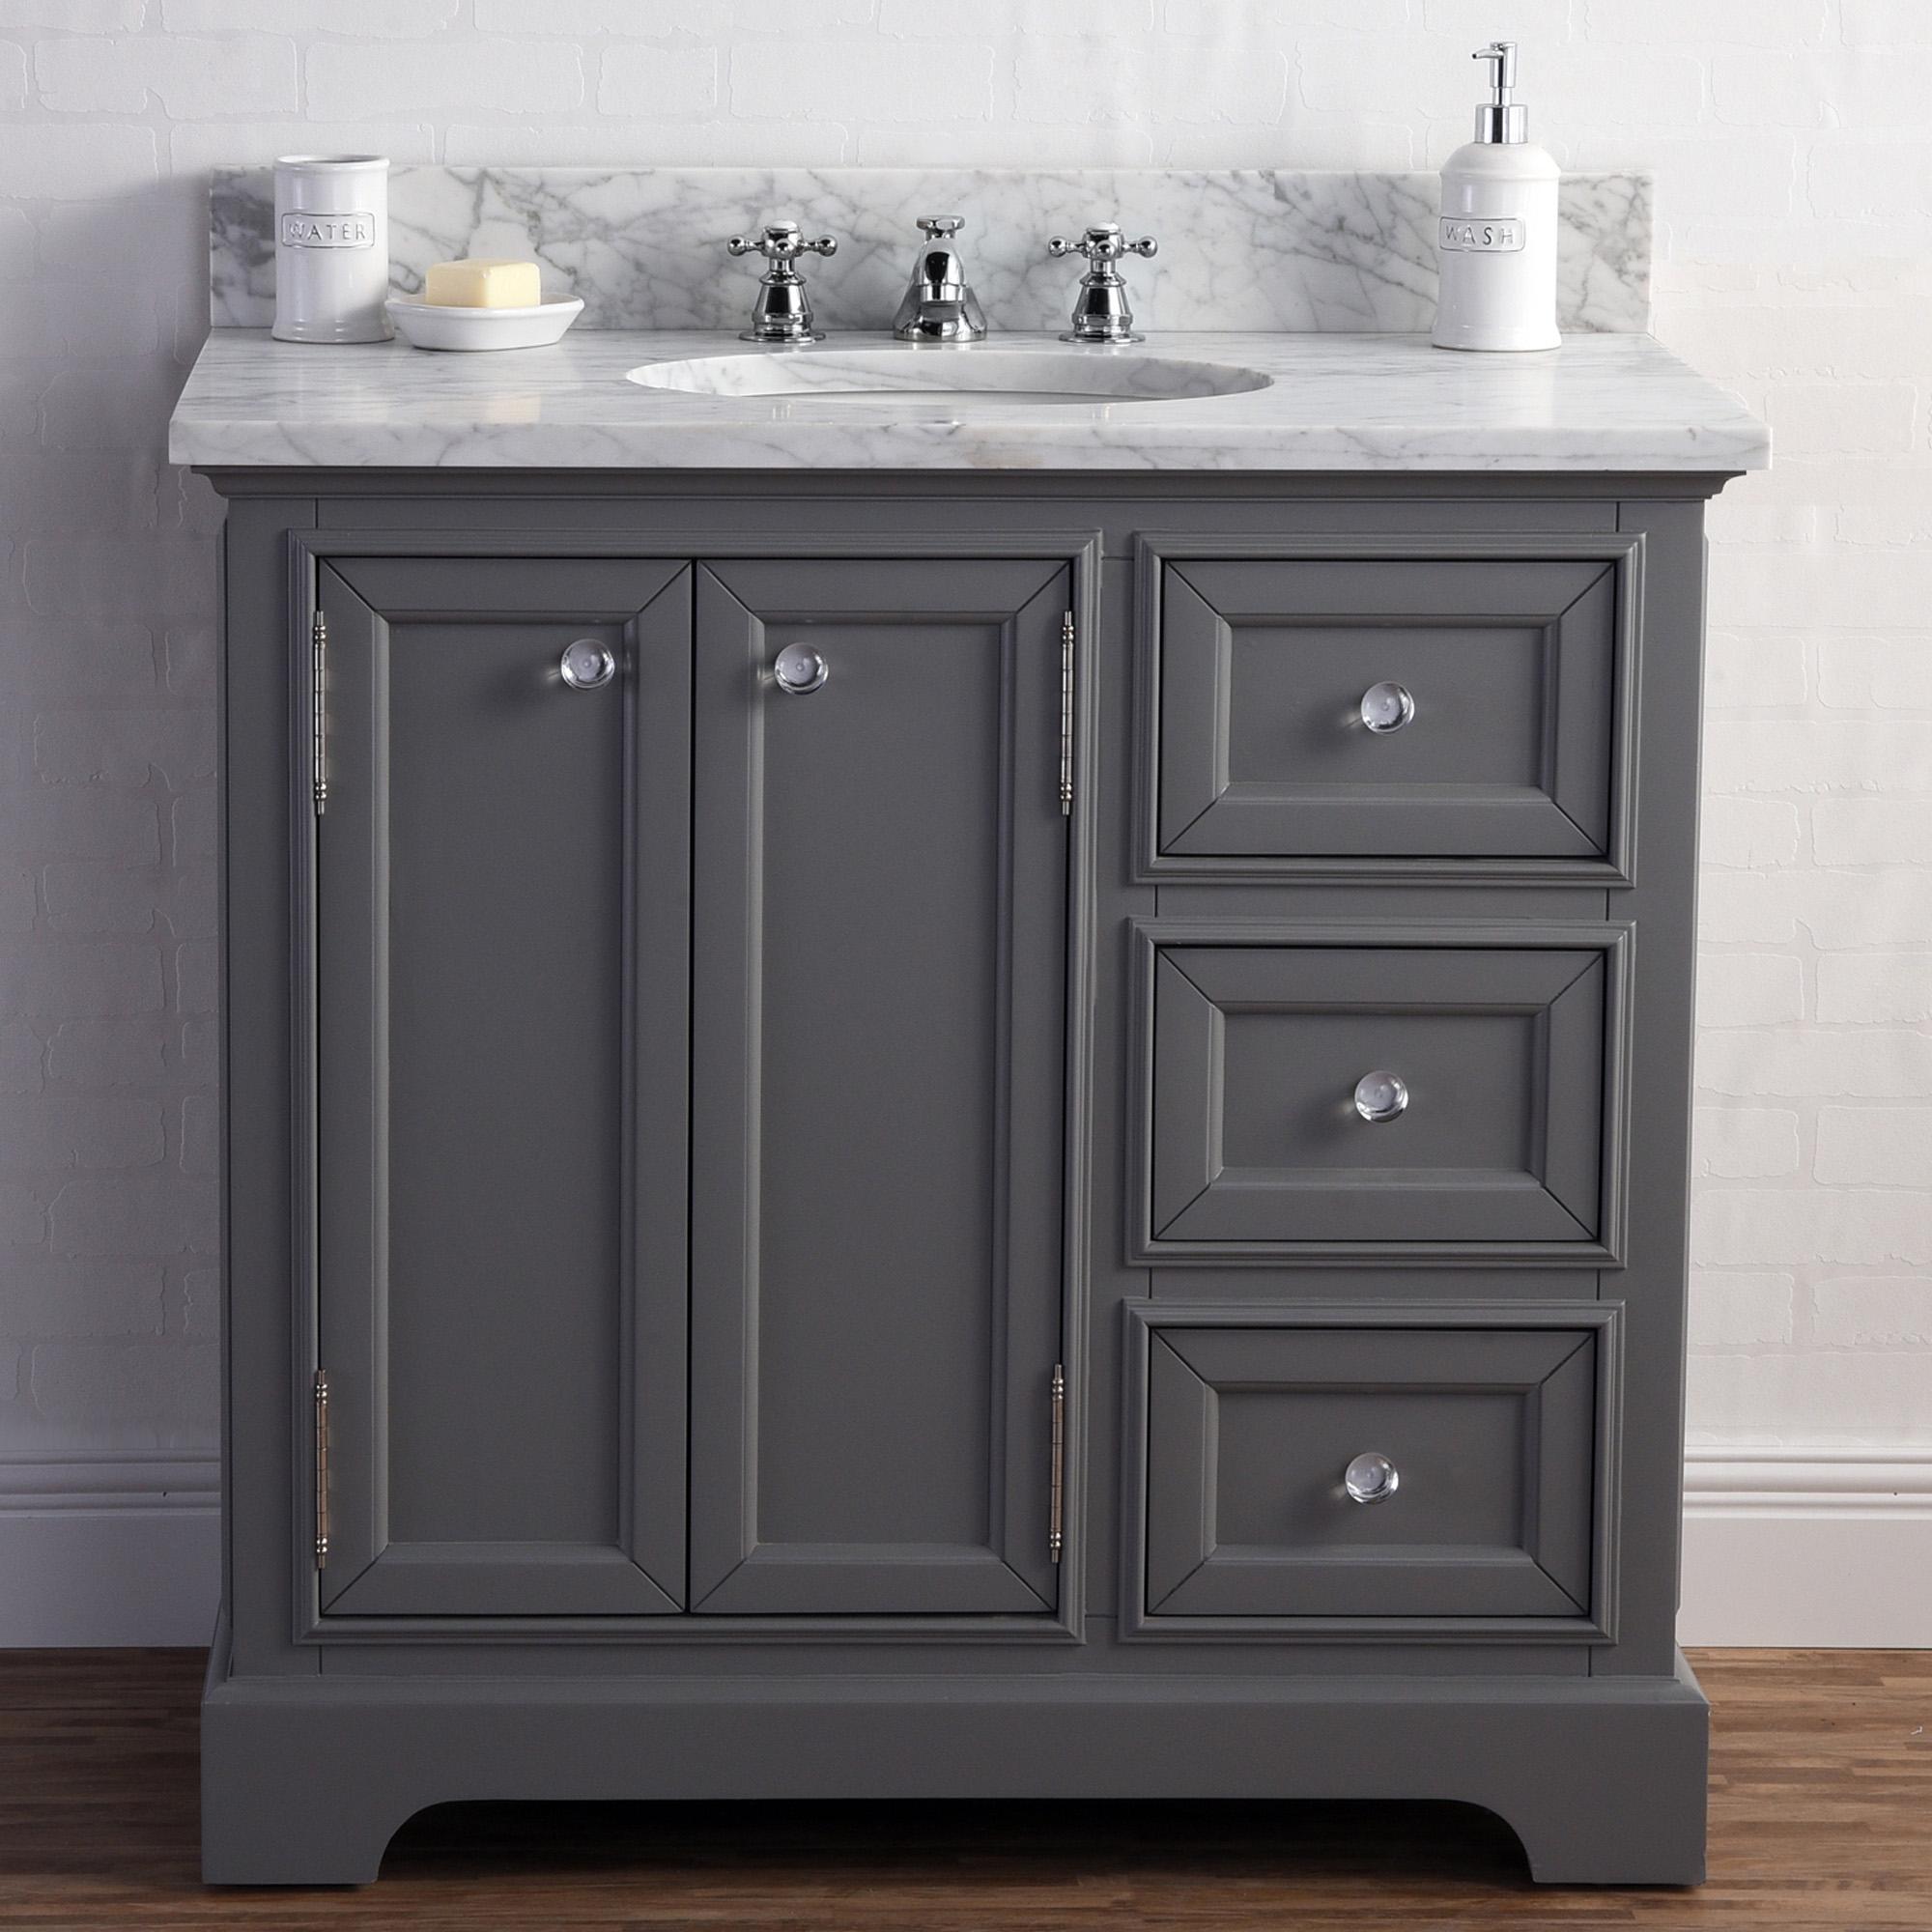 "36"" Wide Cashmere Grey Single Sink Carrara Marble Bathroom Vanity"